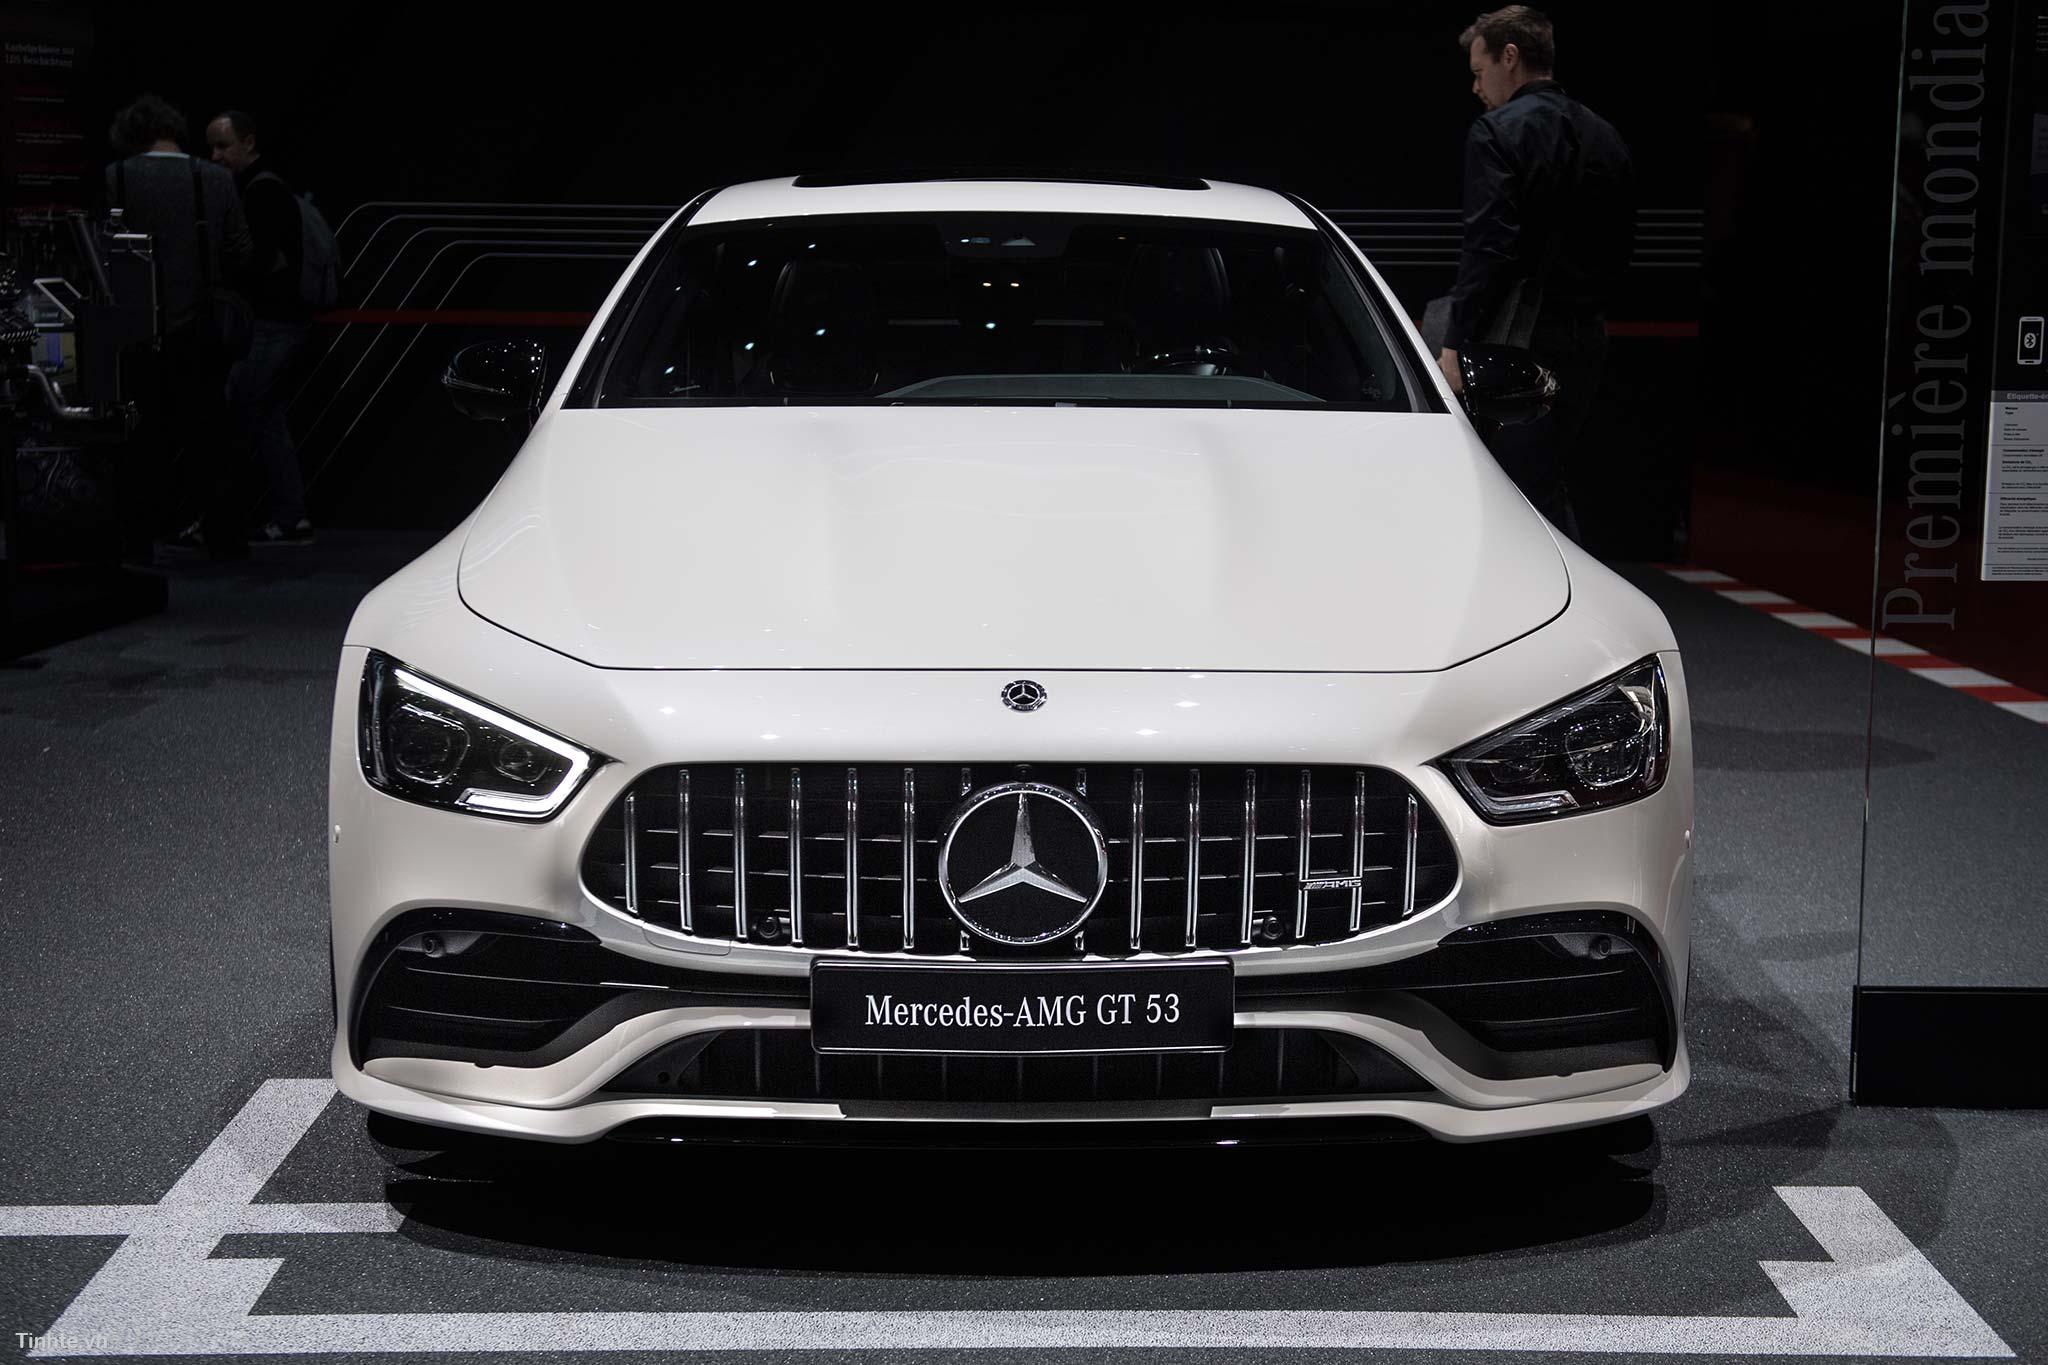 tinhte_Mercedes-AMG-GT-53-2.jpg